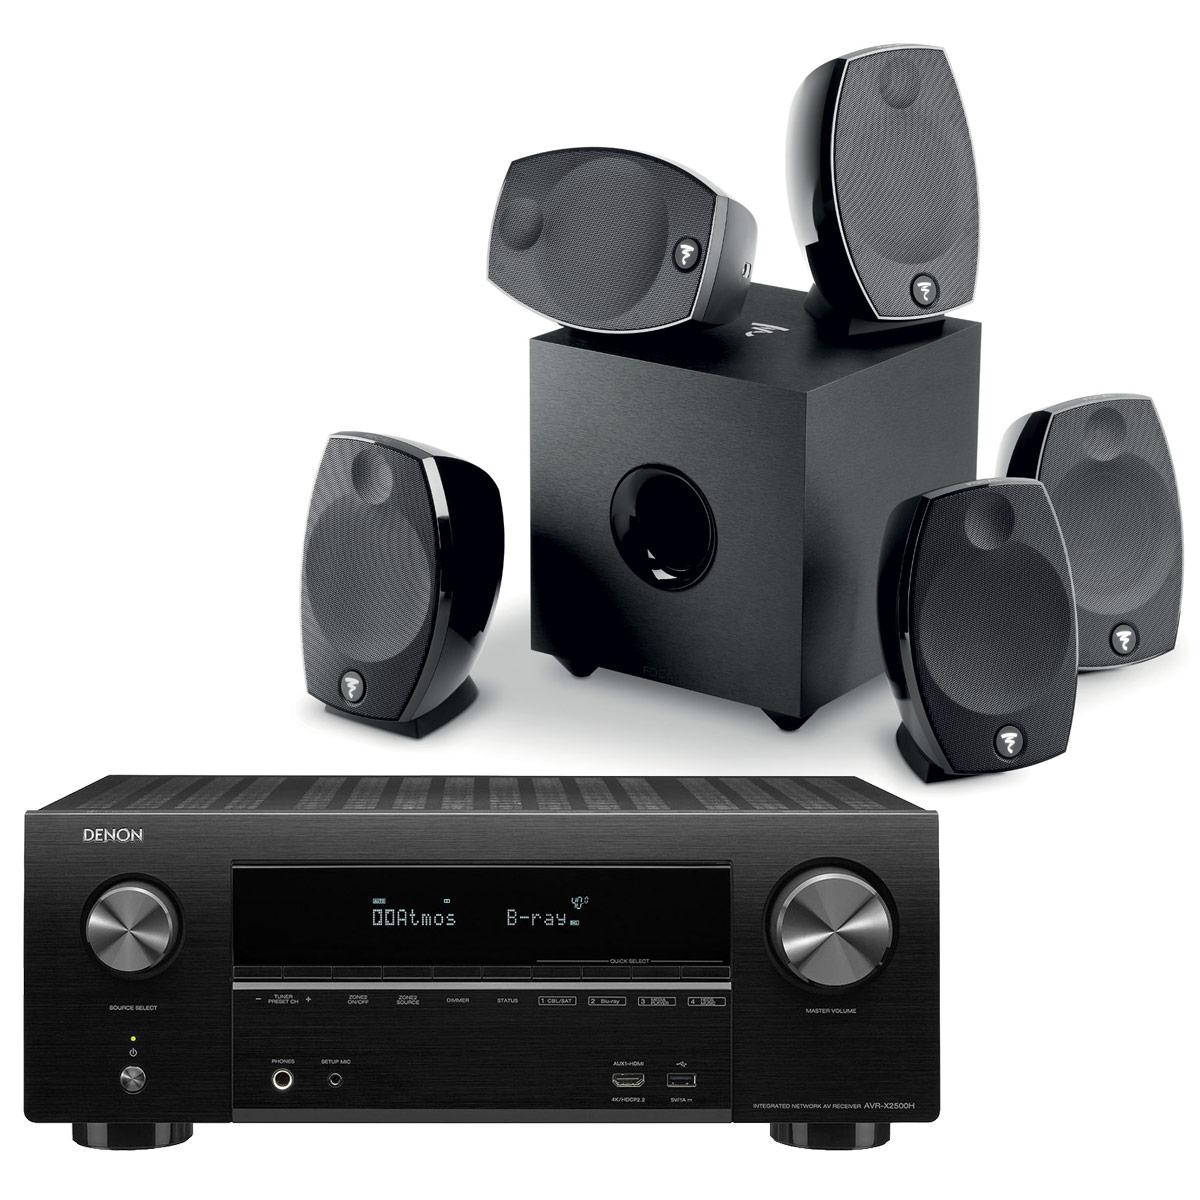 Ensemble home cinéma Denon AVR-X2500H Noir + Focal Sib Evo 5.1 Ampli-tuner Home Cinema 3D Ready 7.2 - Dolby Atmos / DTS:X - 8x HDMI 4K Ultra HD, HDCP 2.2, HDR - Wi-Fi, Bluetooth, AirPlay 2 - Multiroom - Amazon Alexa + Pack d'enceintes 5.1